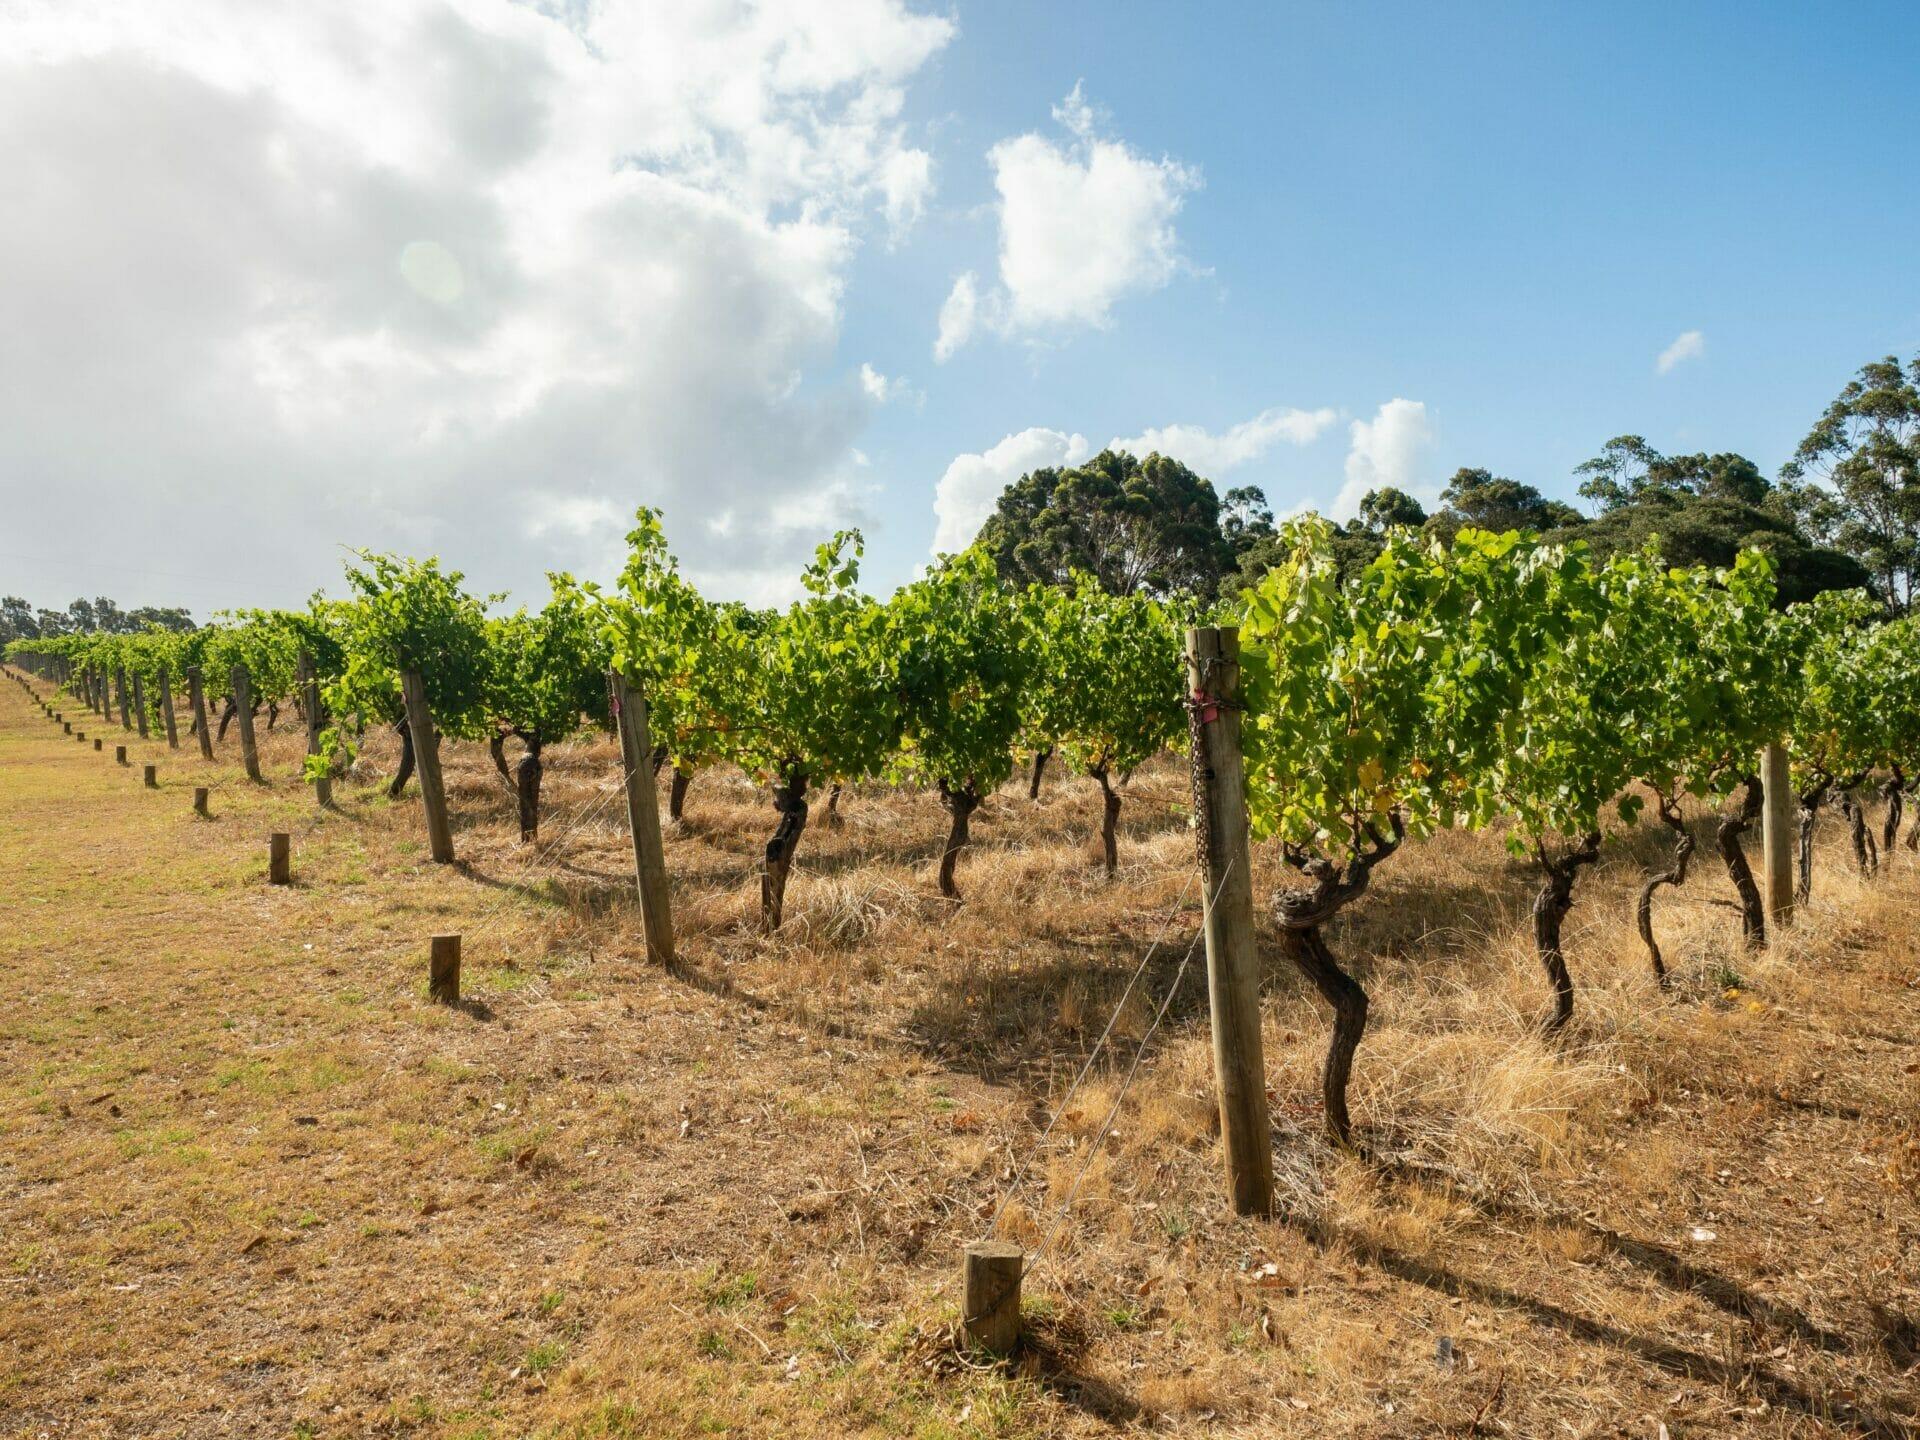 Vineyard Margaret River Western Australia